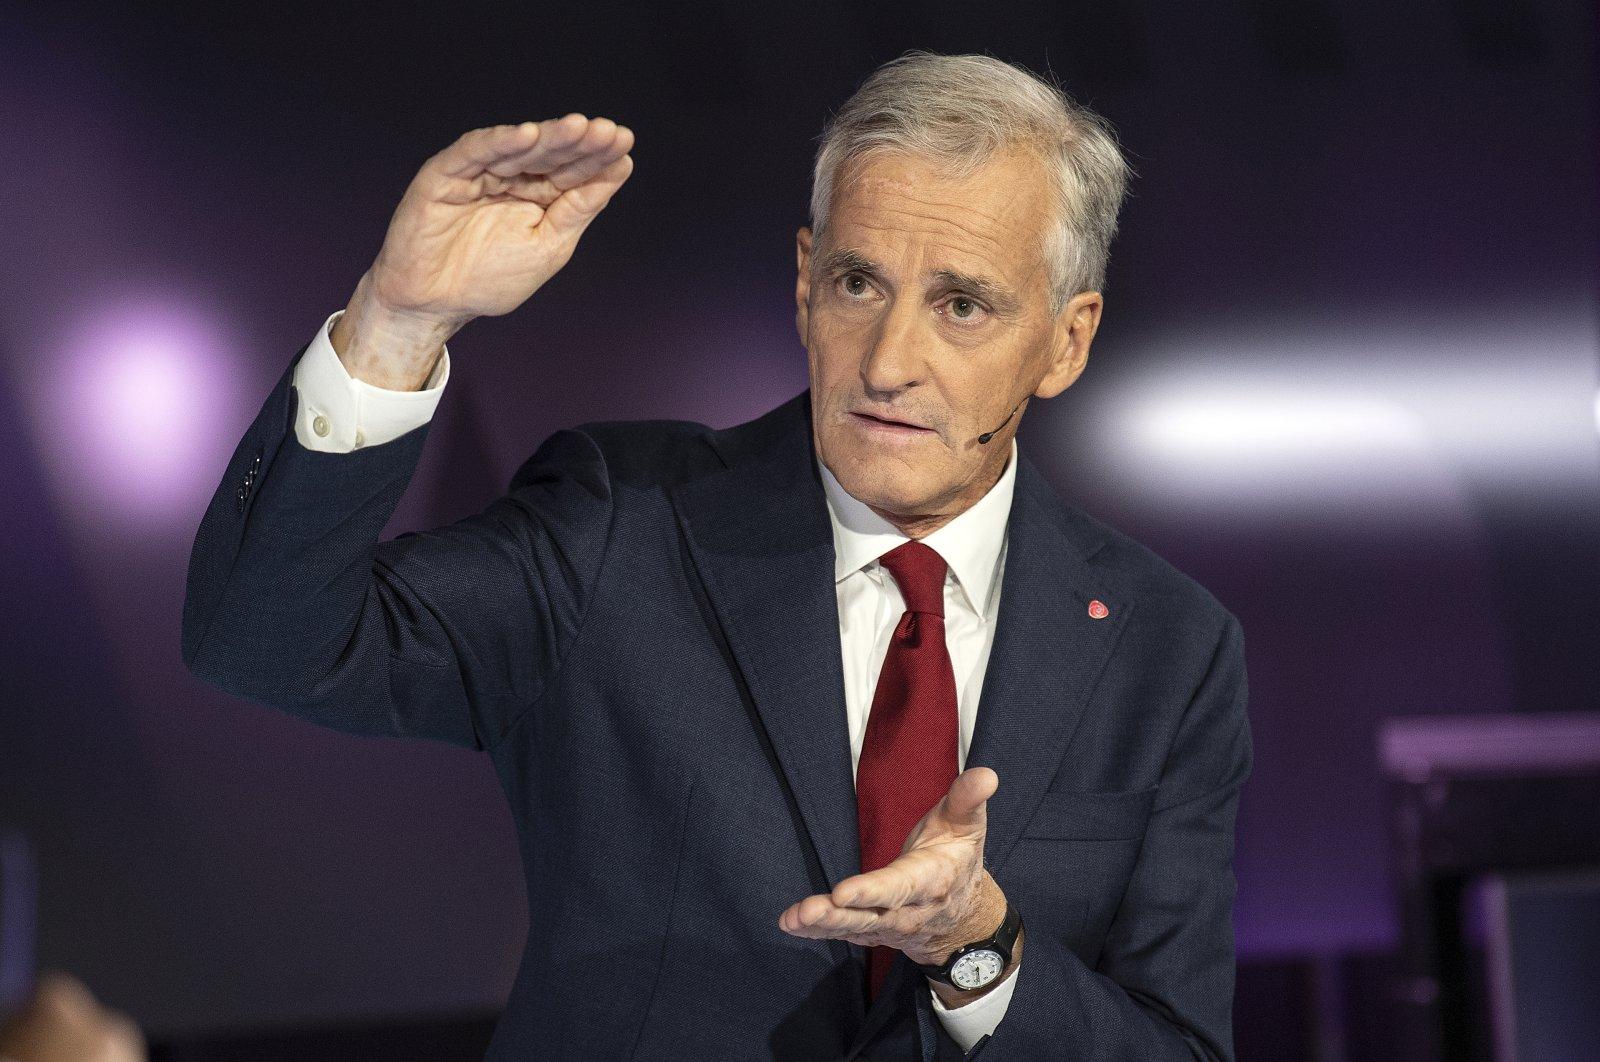 Labor Party leader Jonas Gahr Store speaks during a party leader debate on TV2, in Bergen, Norway, Aug. 31, 2021. (AP Photo)